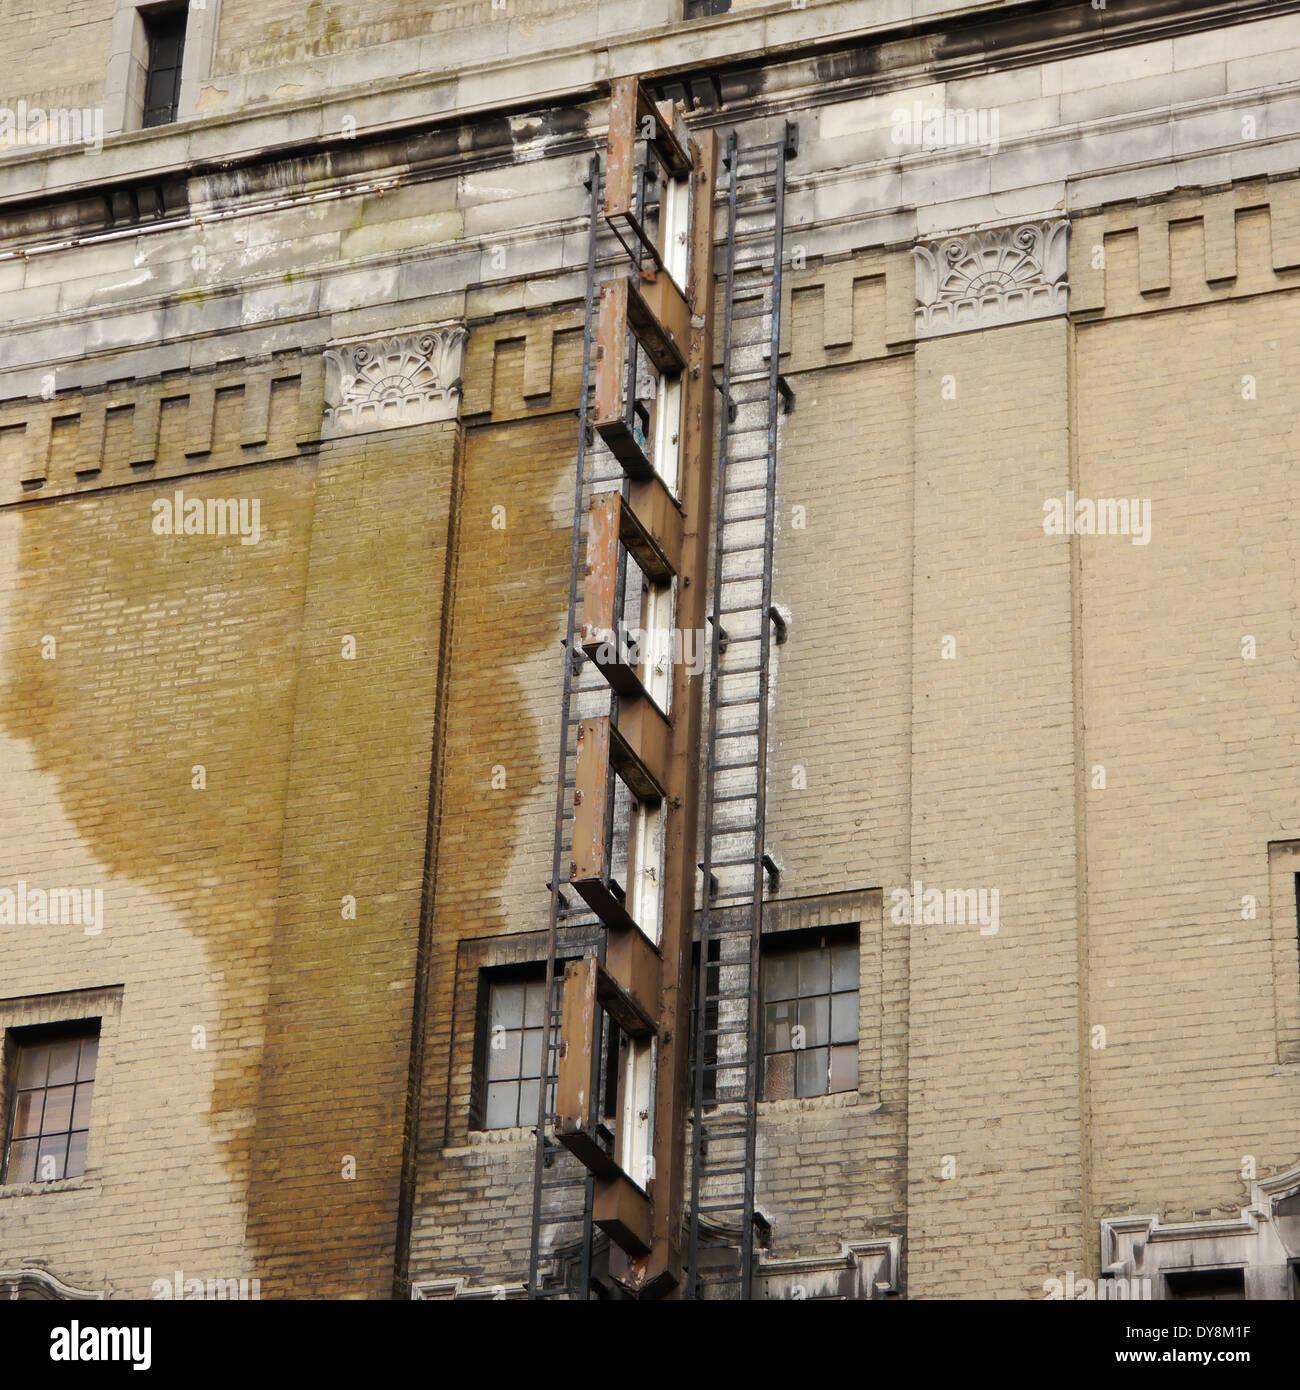 Abandoned Buildings Newcastle Uk: Derelict Abandoned Cinema Stock Photos & Derelict